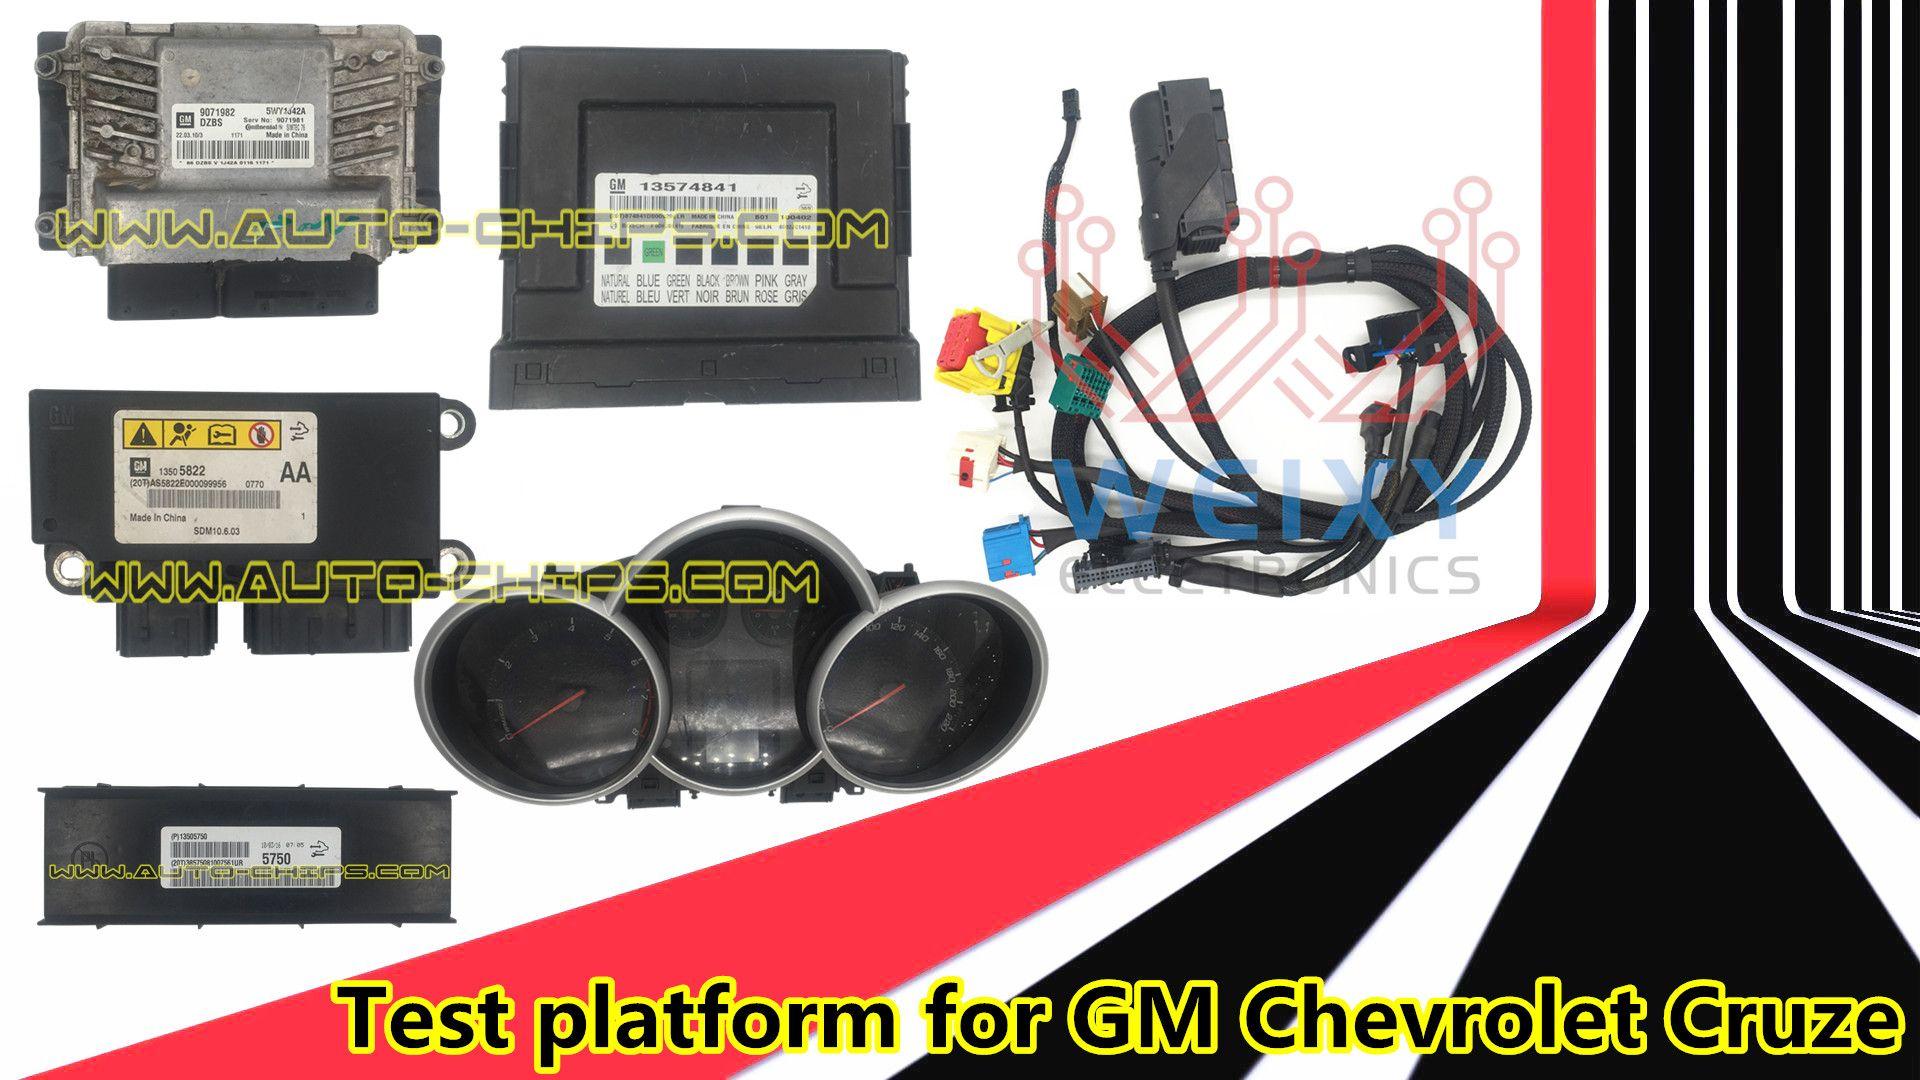 small resolution of gm chevrolet cruze test platform enable programing keys on the bench restore airbag ecm